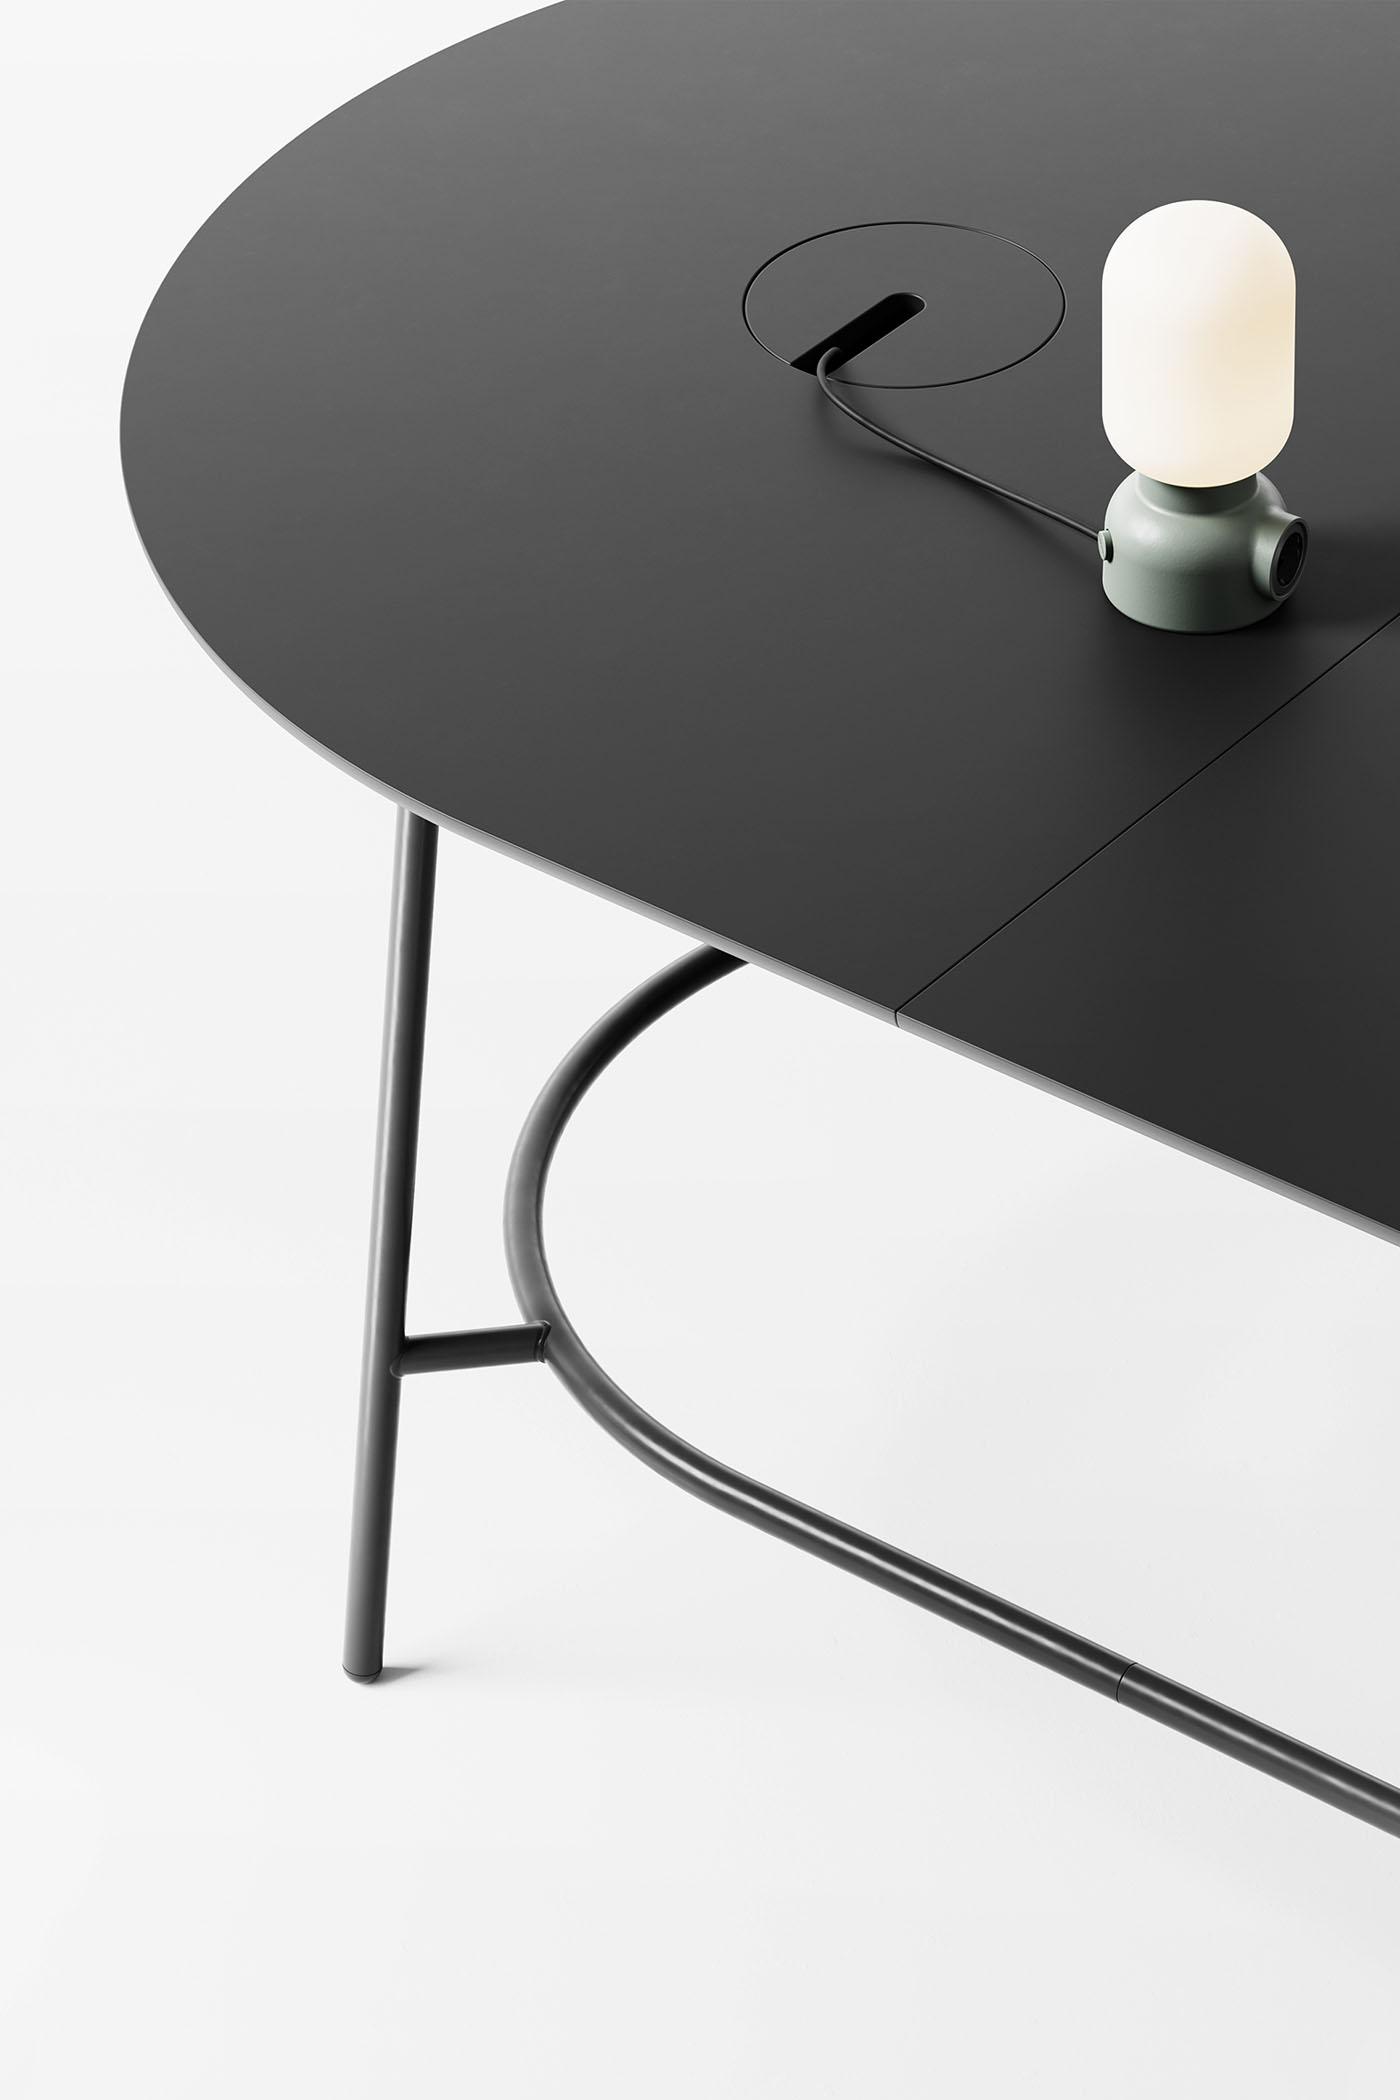 Nest极简主义的模块化桌子皇冠新2网